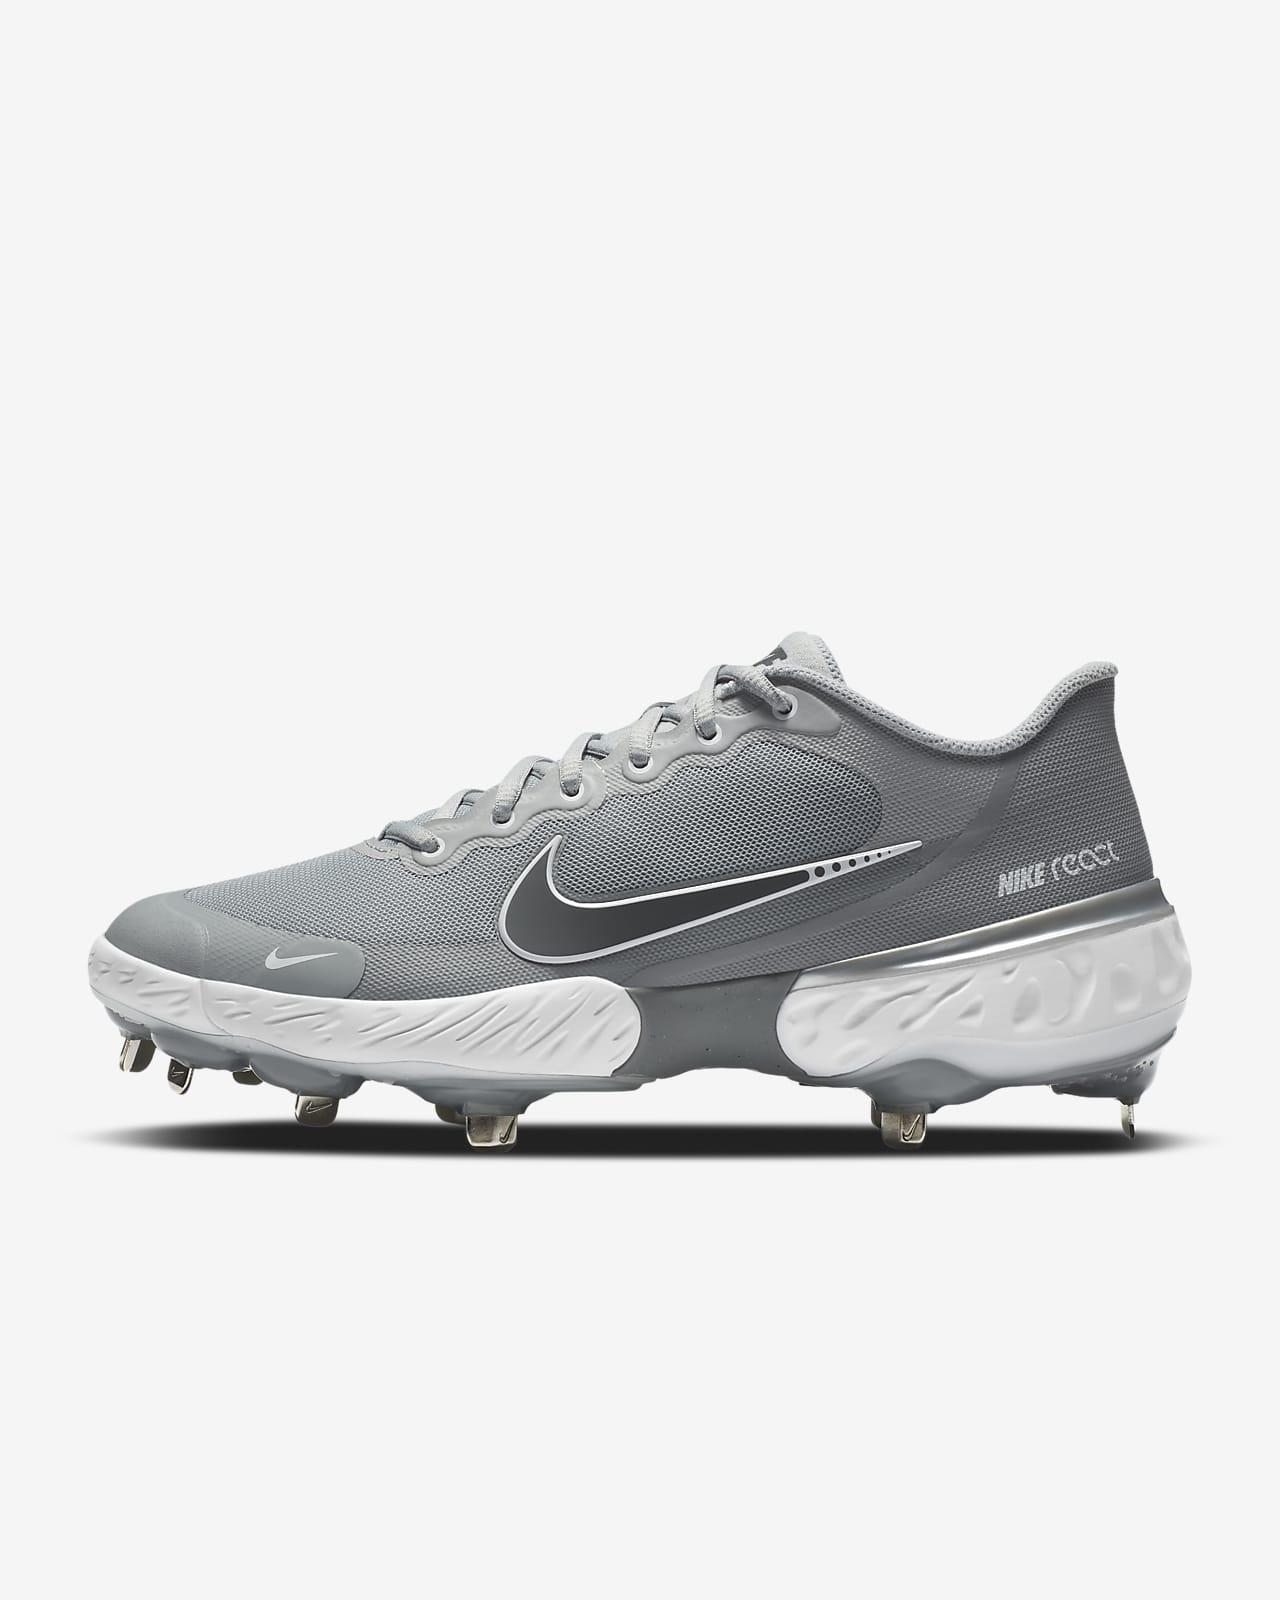 Nike Alpha Huarache Elite 3 Low Baseball Cleat